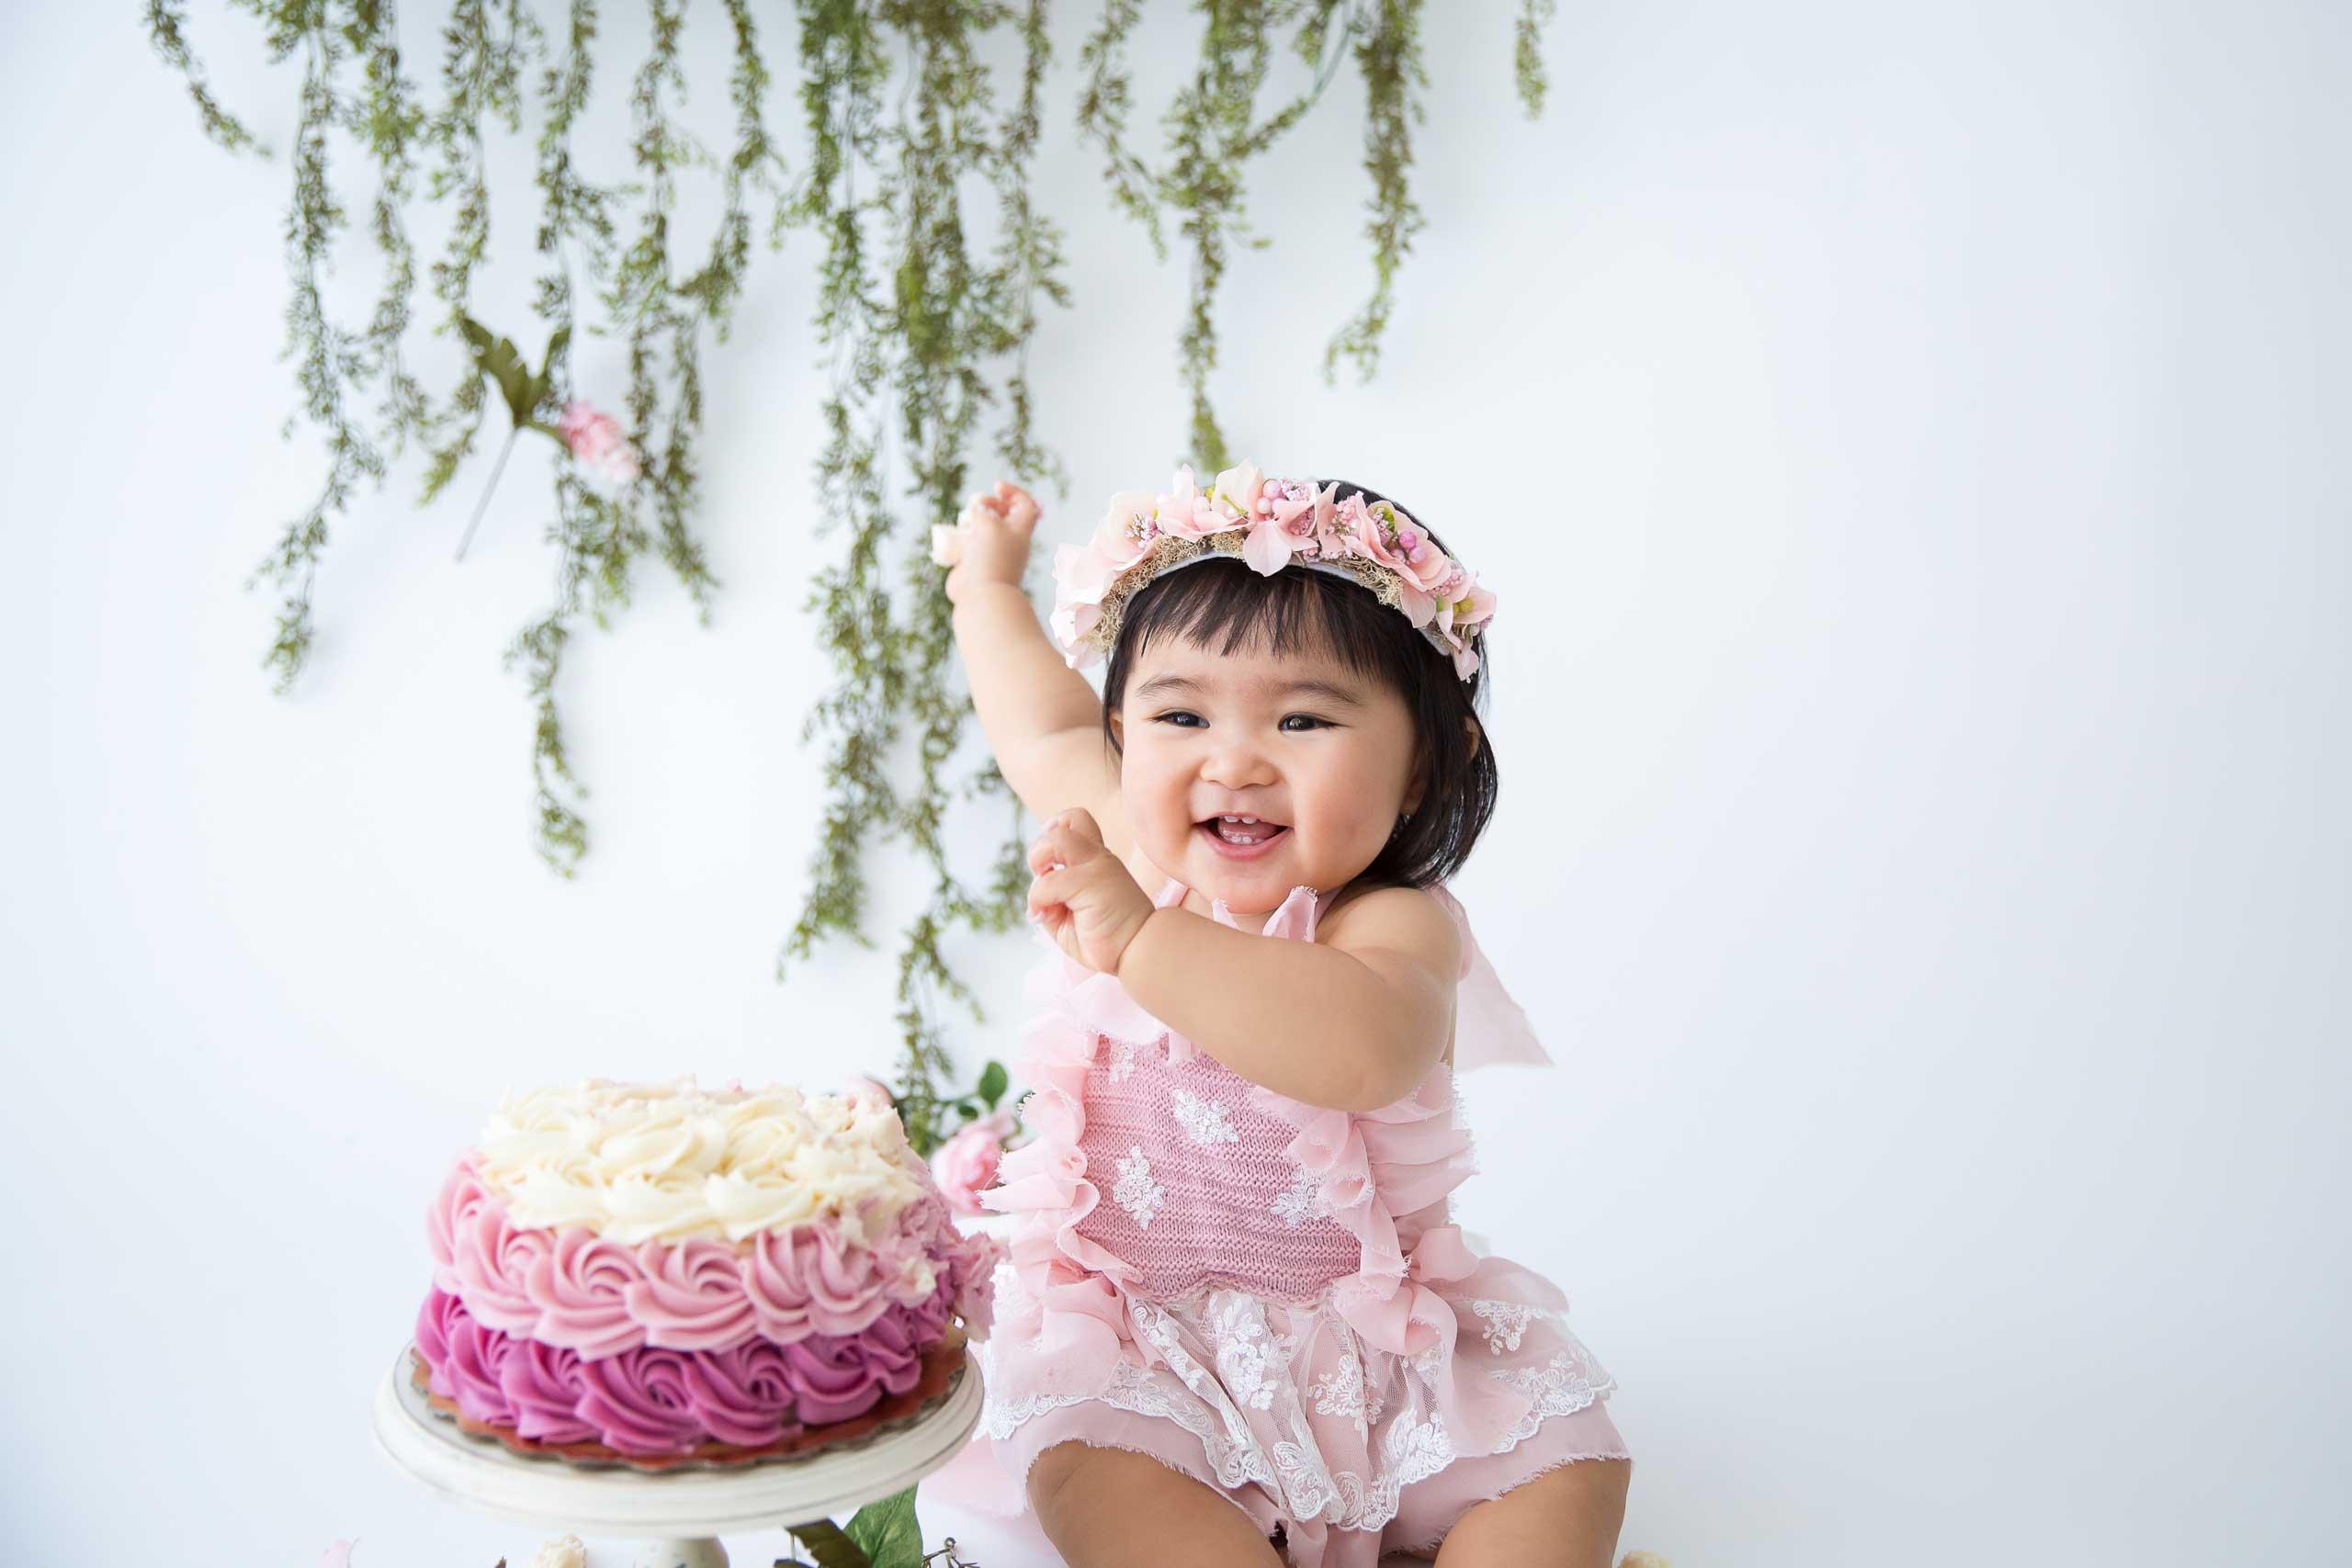 cake smash baby photography los angeles ramina magid 4323